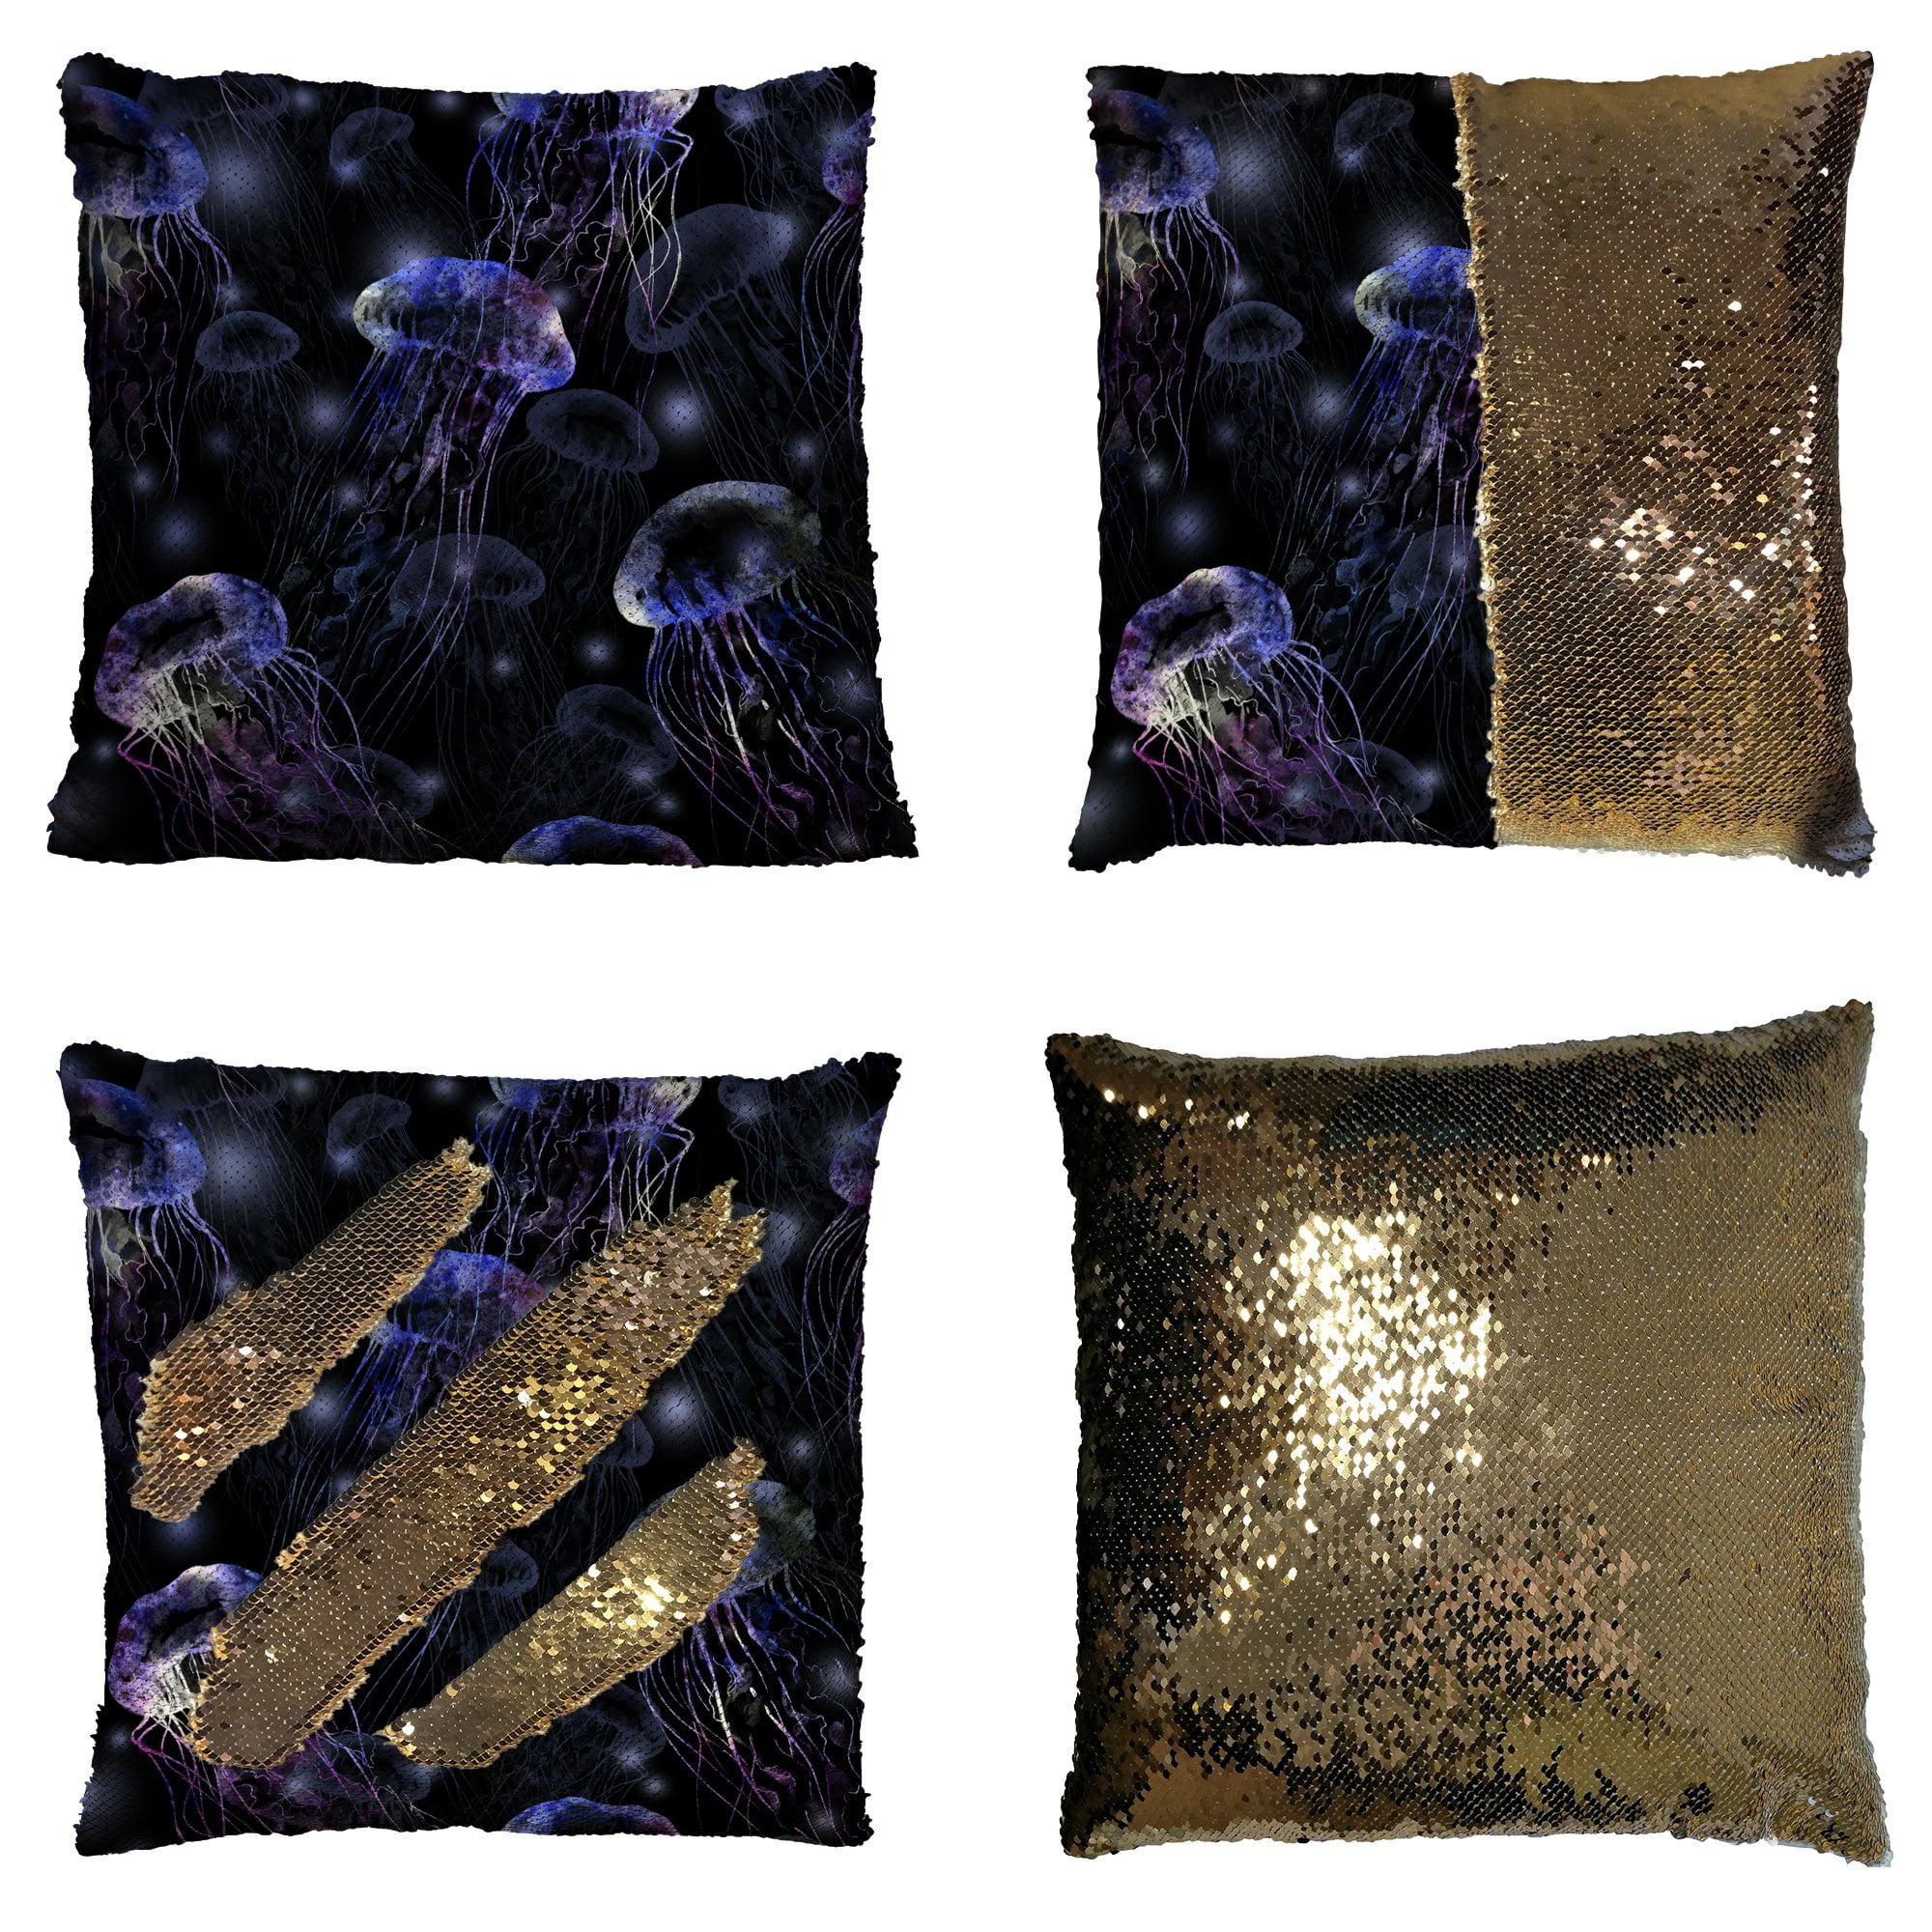 GCKG Underwater Pillowcase, Tropical Beach Magical Jellyfish Purple Reversible Mermaid Sequin Pillow Case Home Decor Cushion Cover 16x16 inches